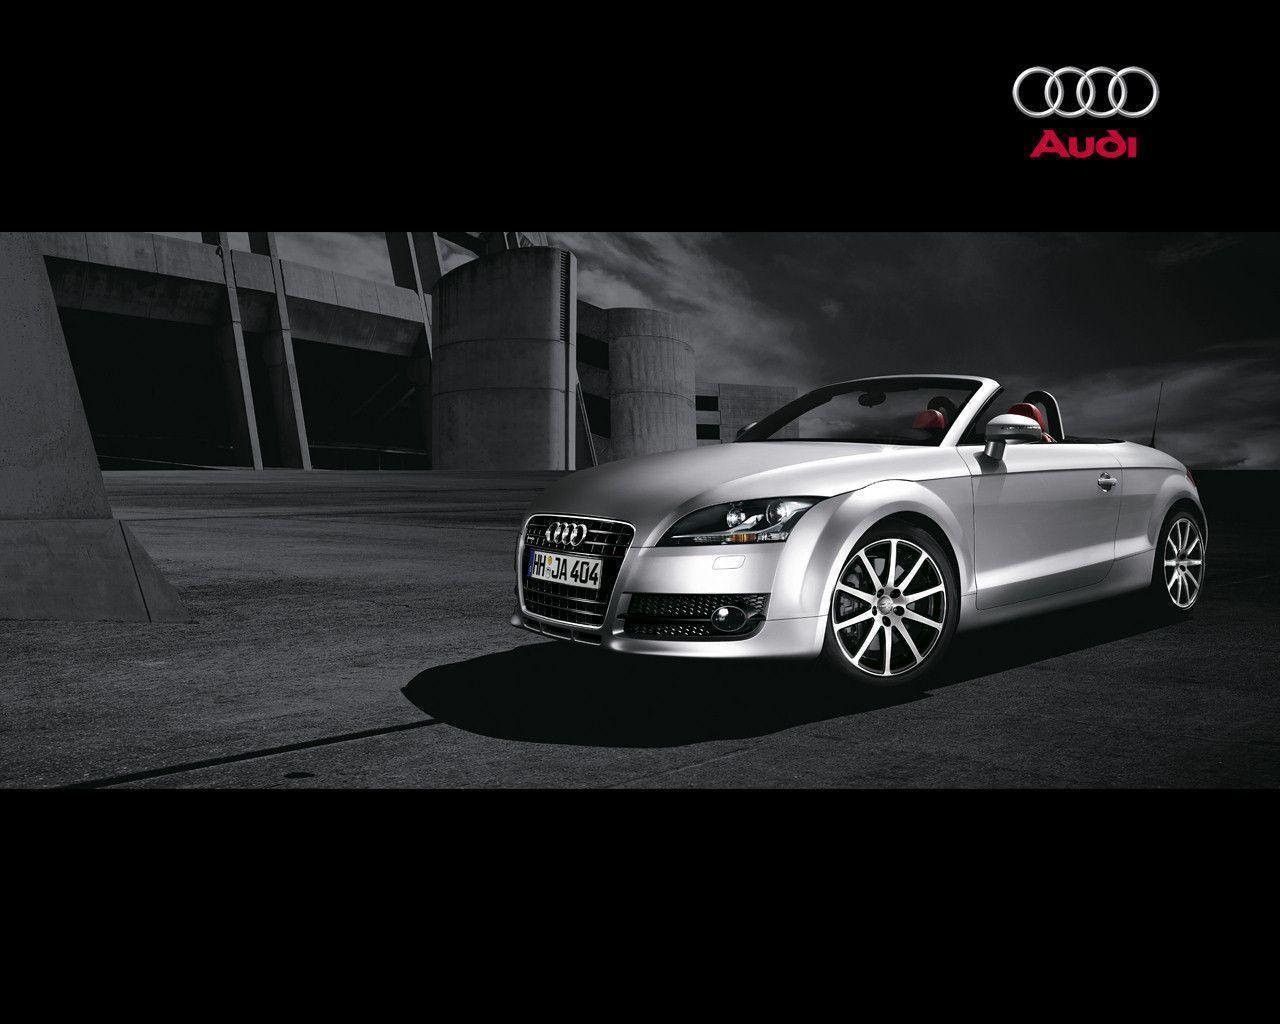 Audi Tt Wallpapers Wallpaper Cave